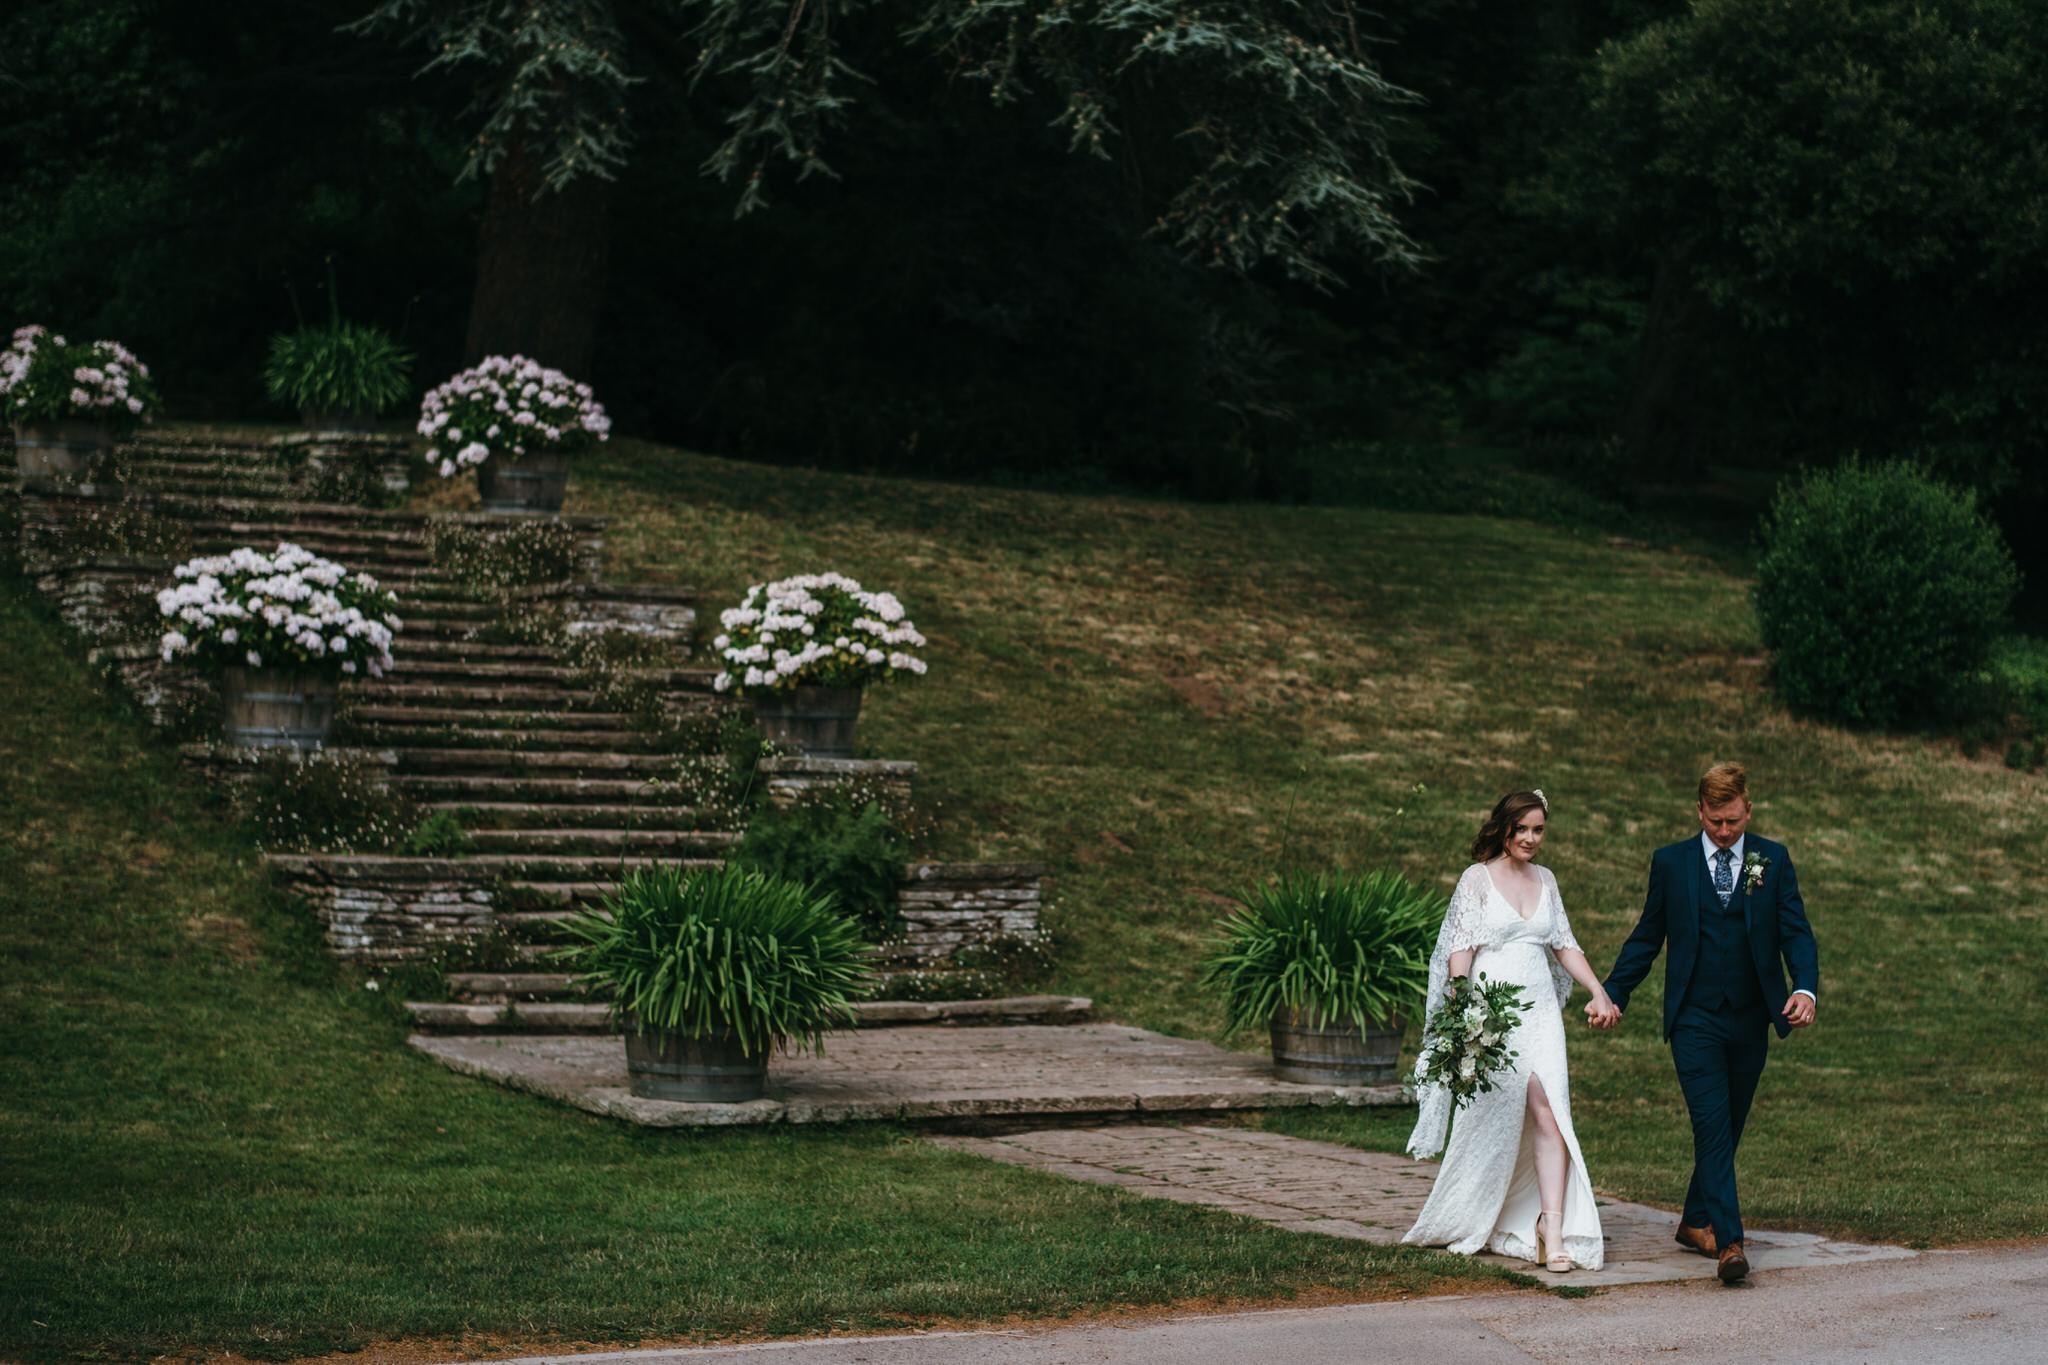 hestercombe gardens somerset wedding photographer